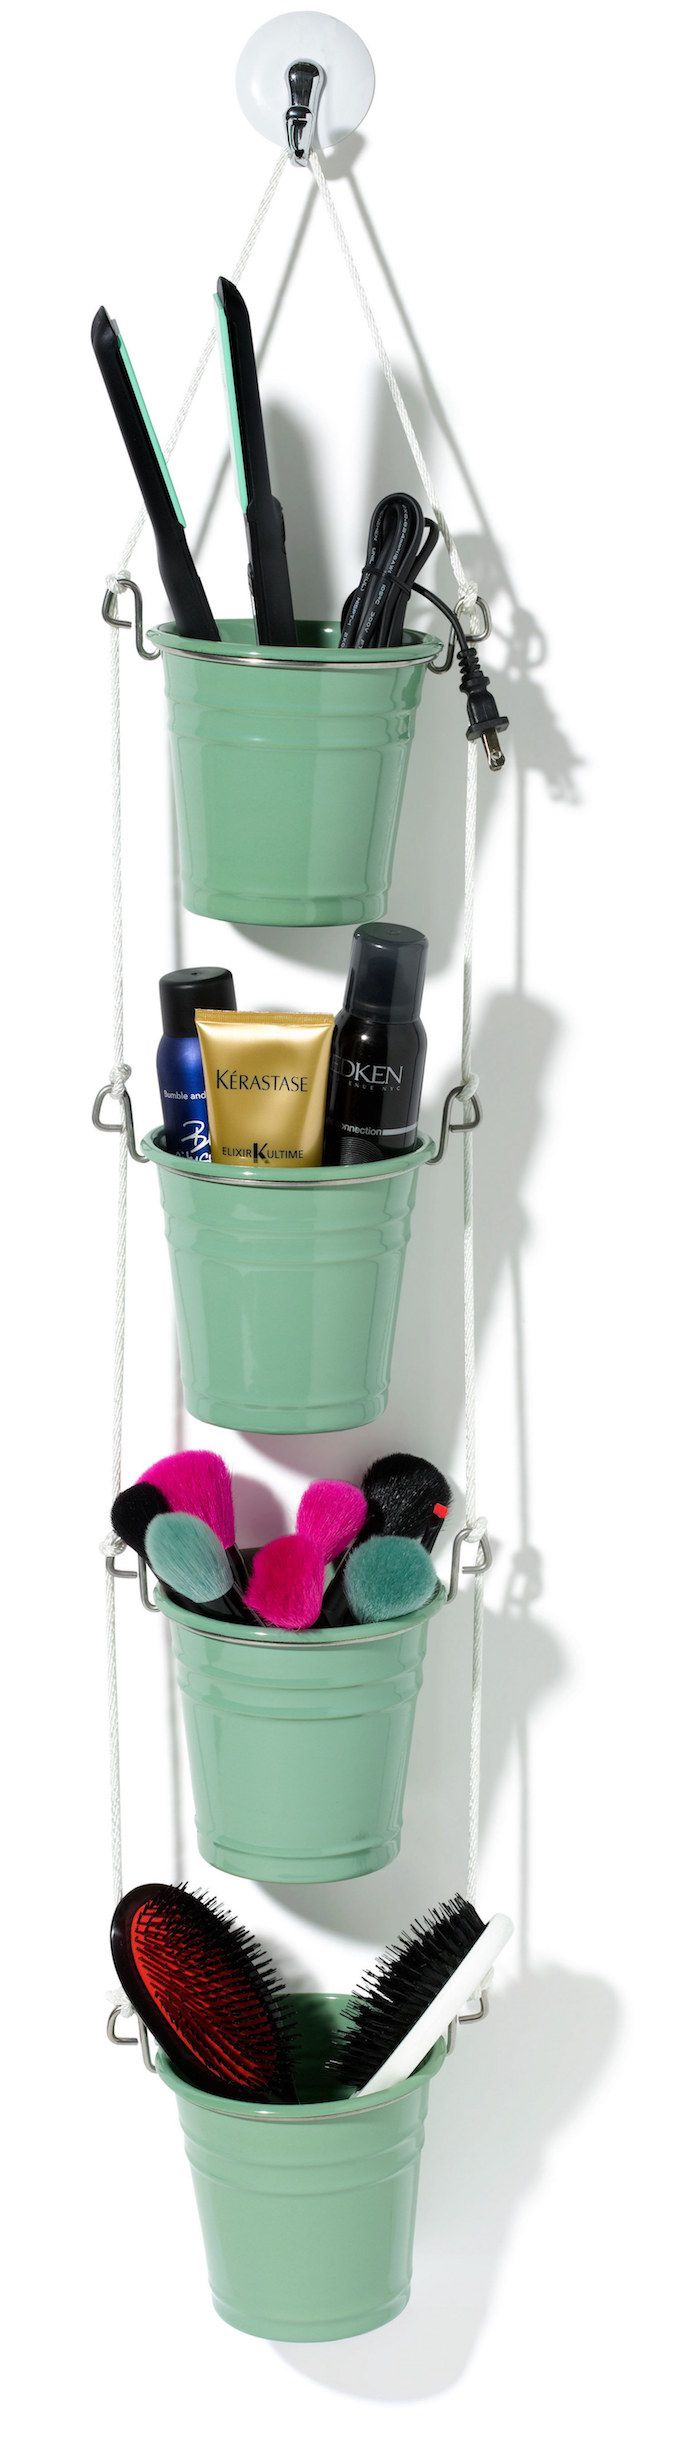 bucket hanging storage diy bathroom